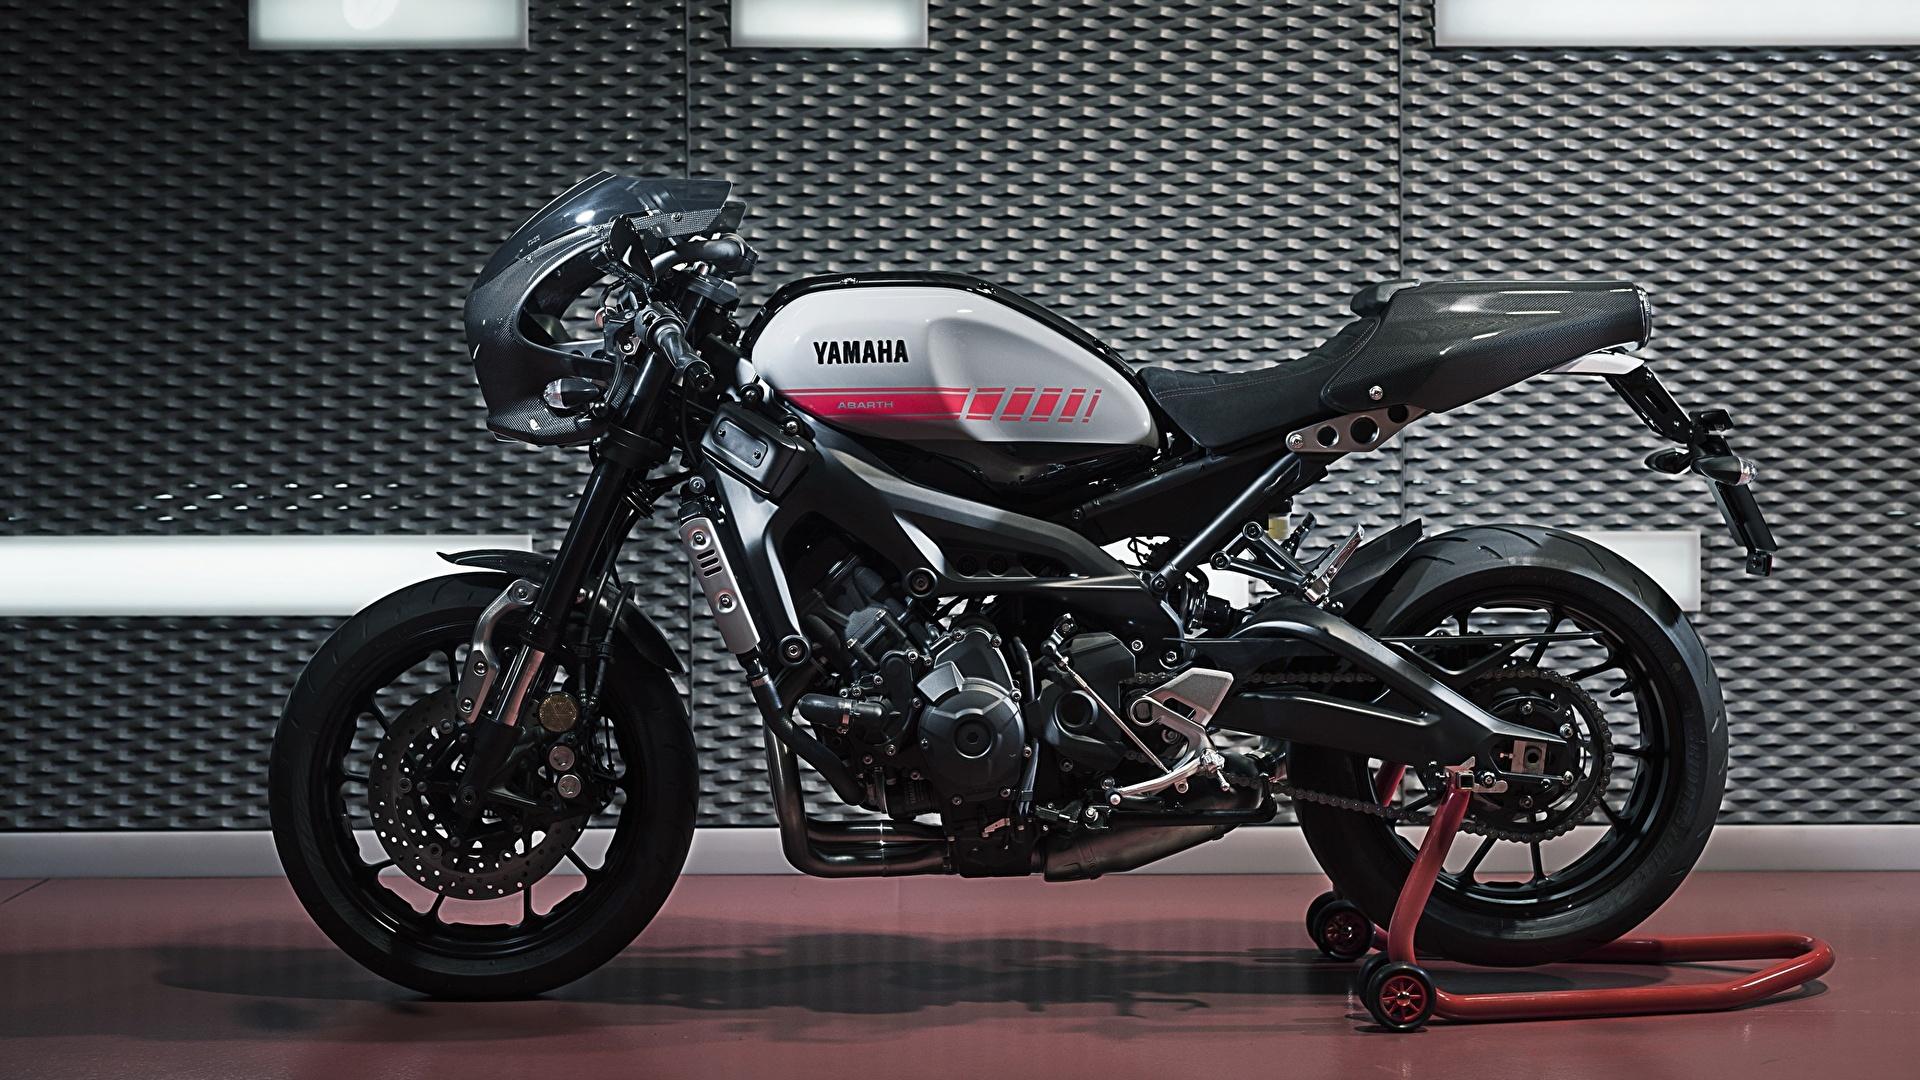 Картинка Yamaha Тюнинг XSR90 Abarth мотоцикл Сбоку 1920x1080 Ямаха Стайлинг Мотоциклы